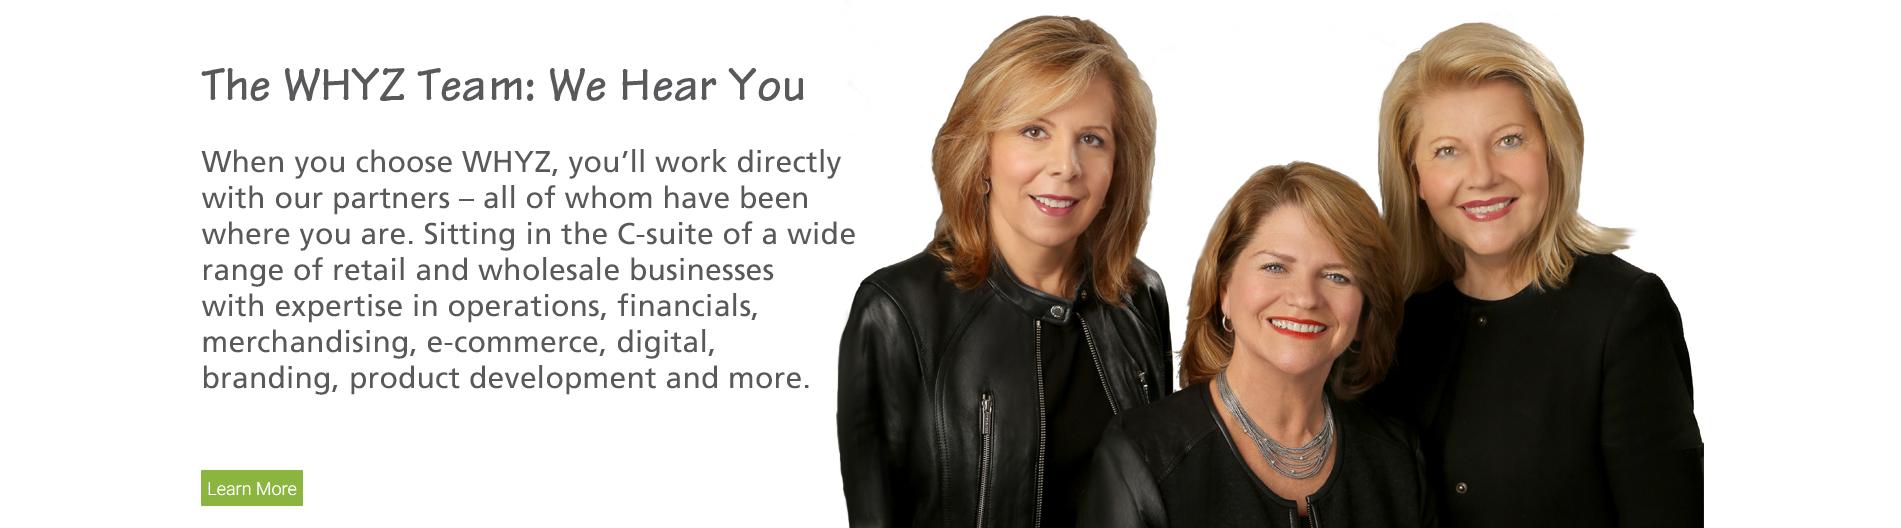 The WHYZ Team: We Hear You